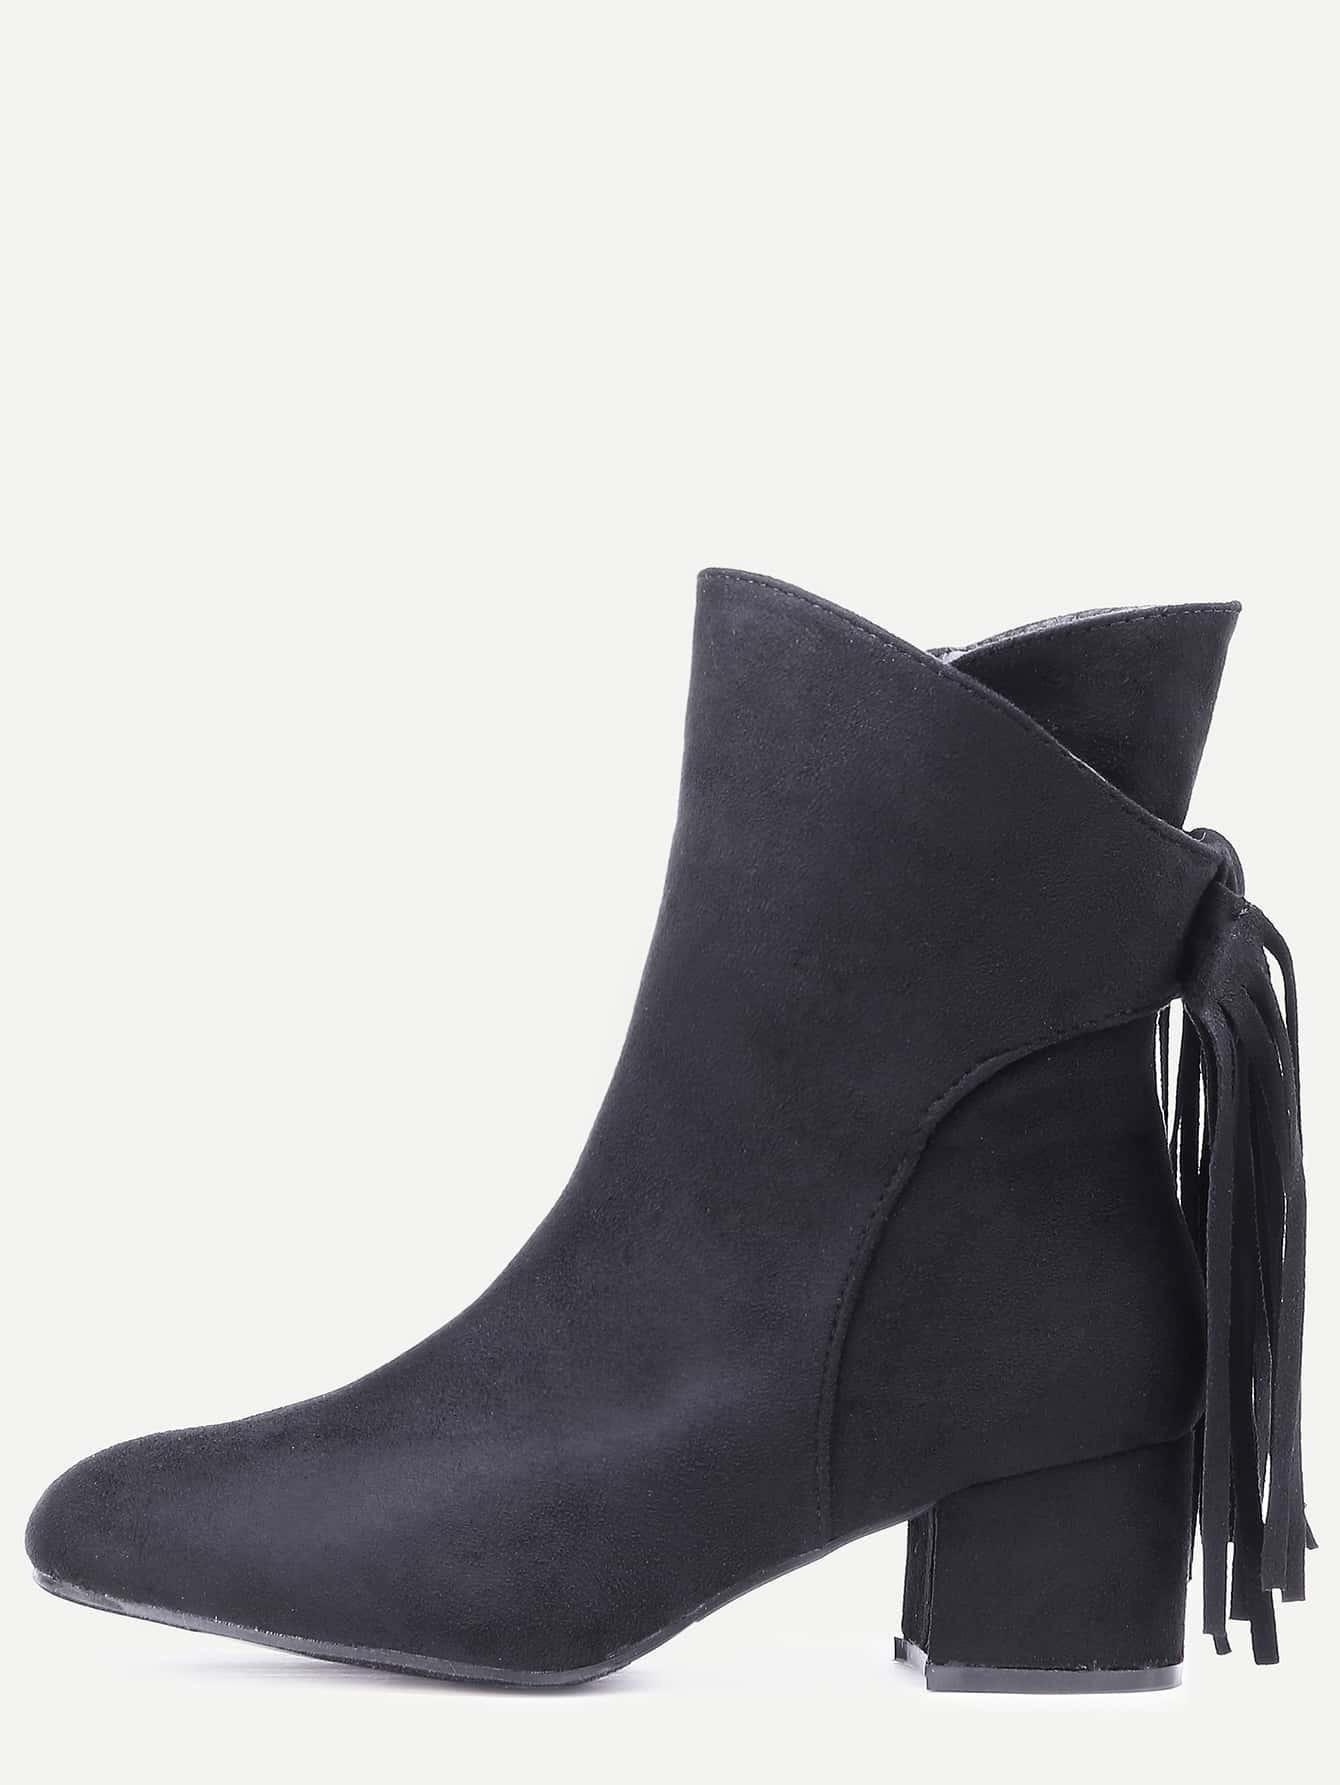 black suede fringe point toe boots